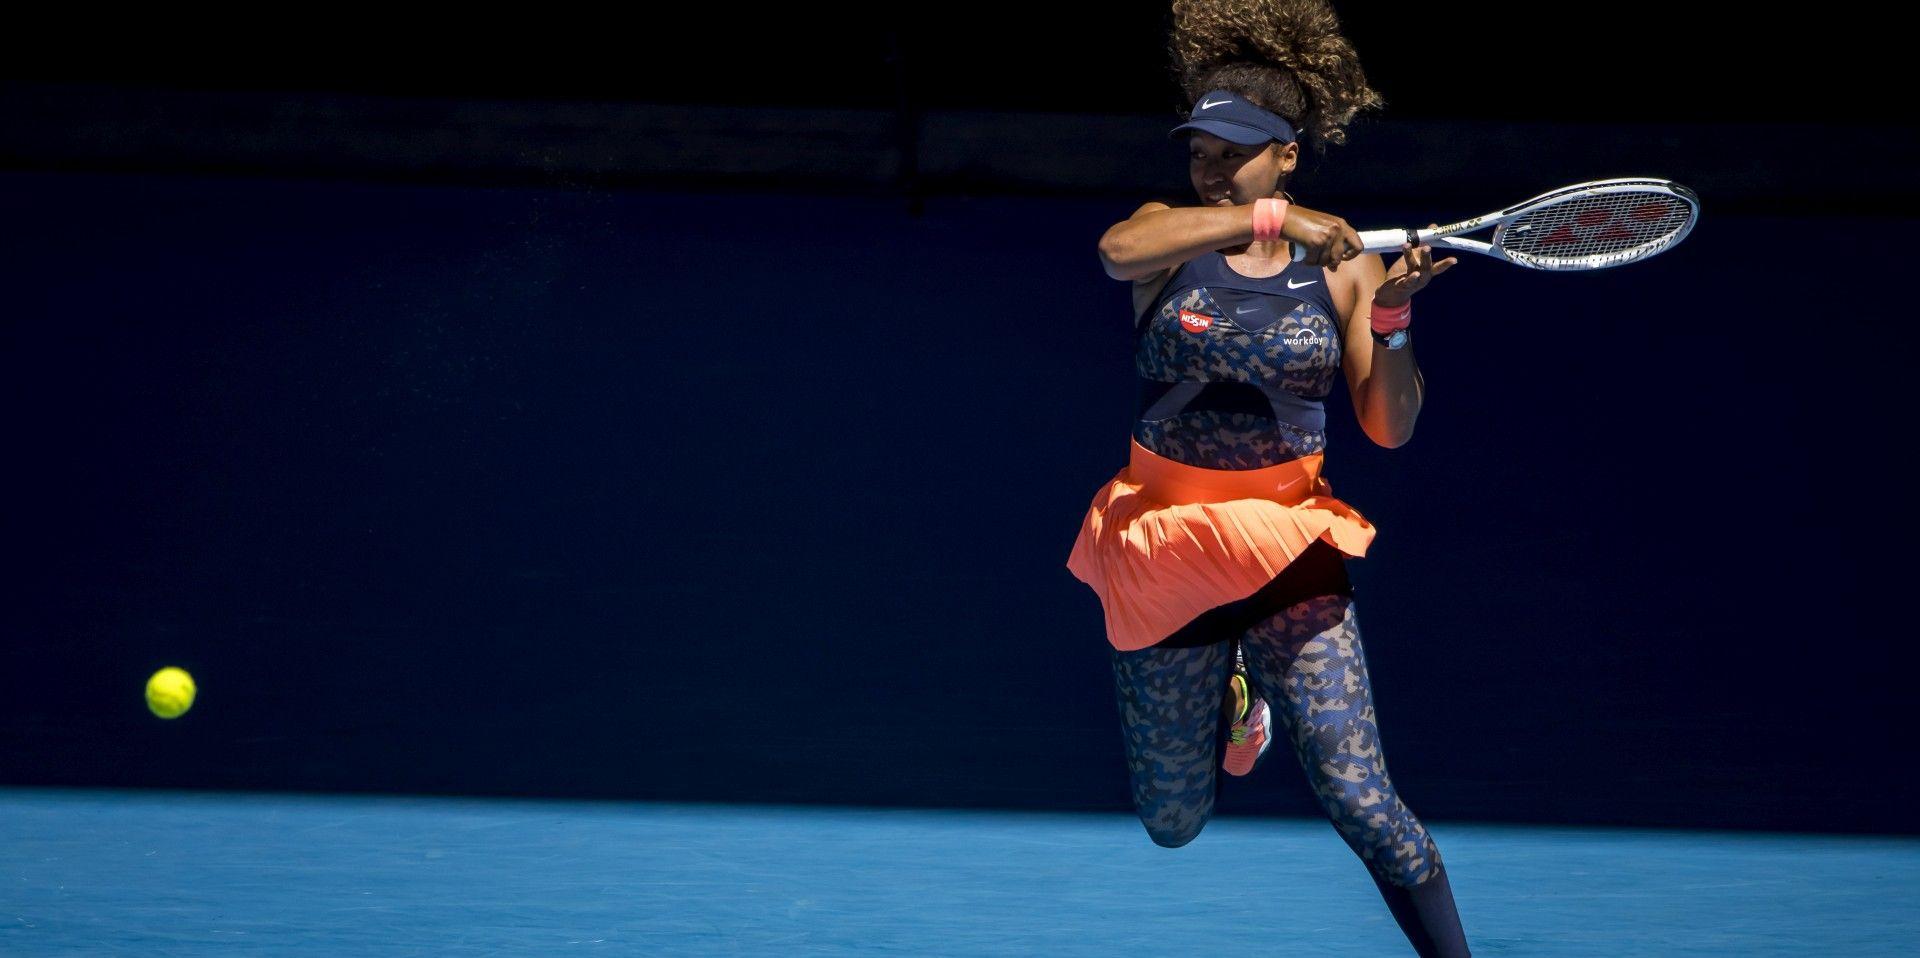 TAG Heuer泰格豪雅品牌大使大坂直美贏得澳洲公開賽女單冠軍